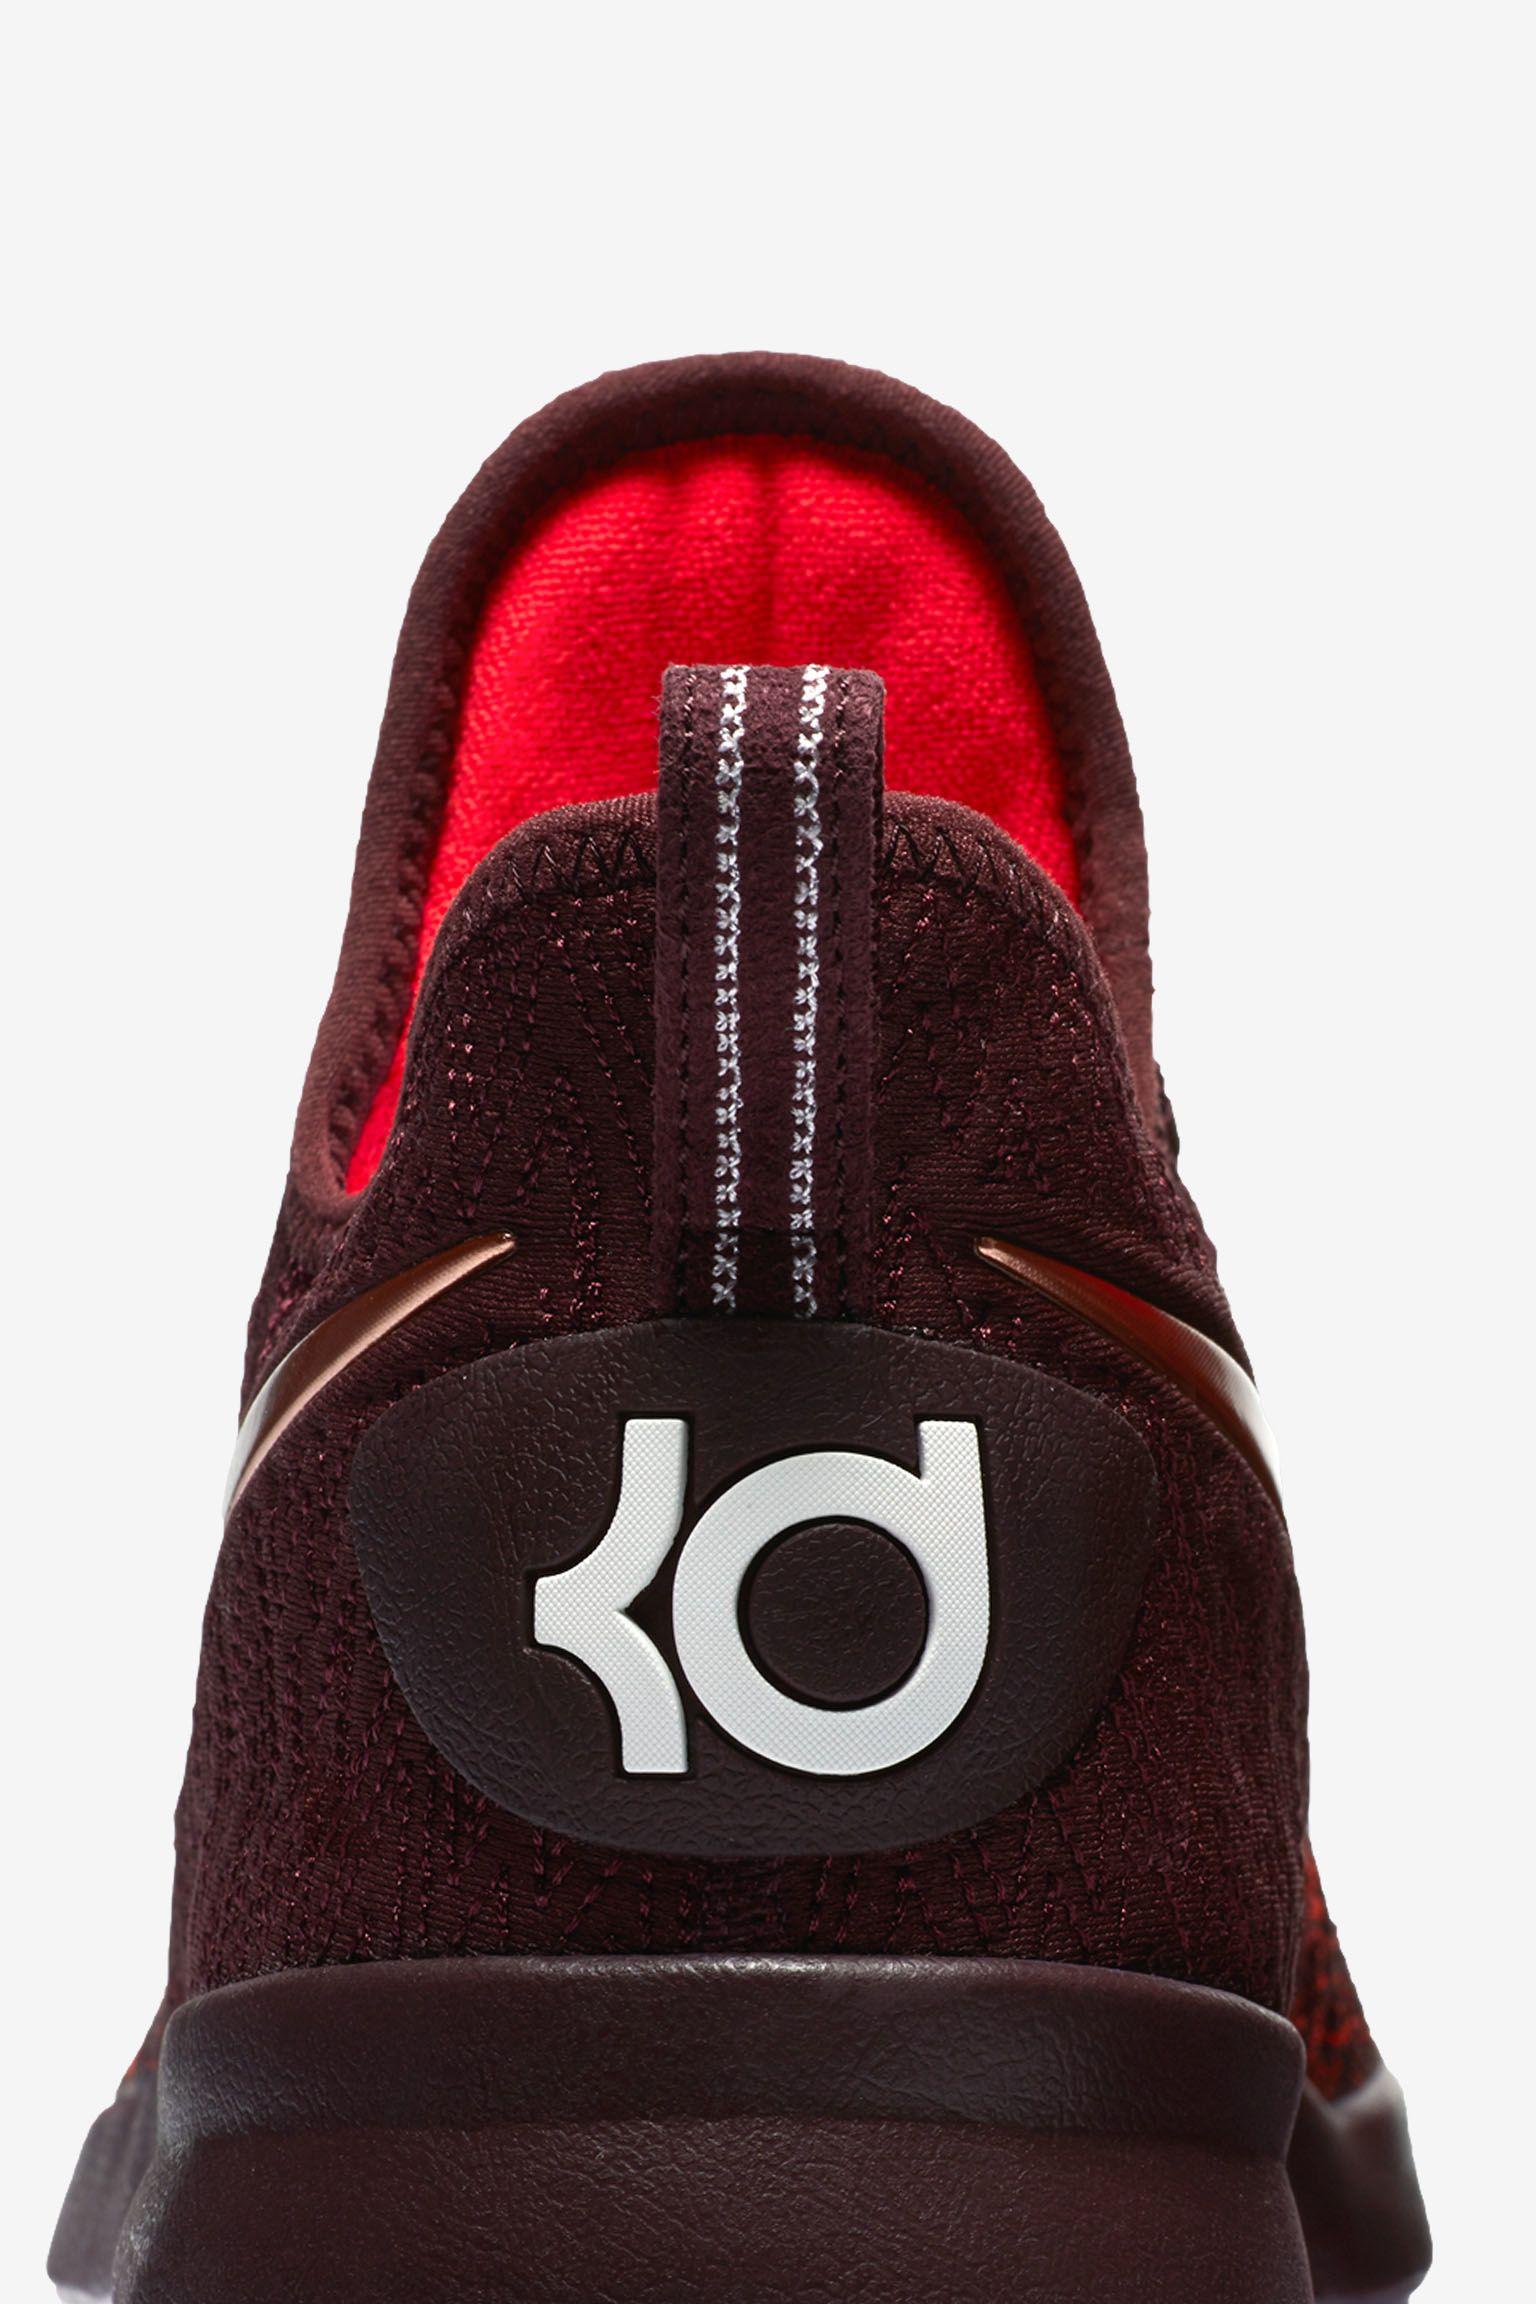 Nike Zoom KD 9 'The Sauce'